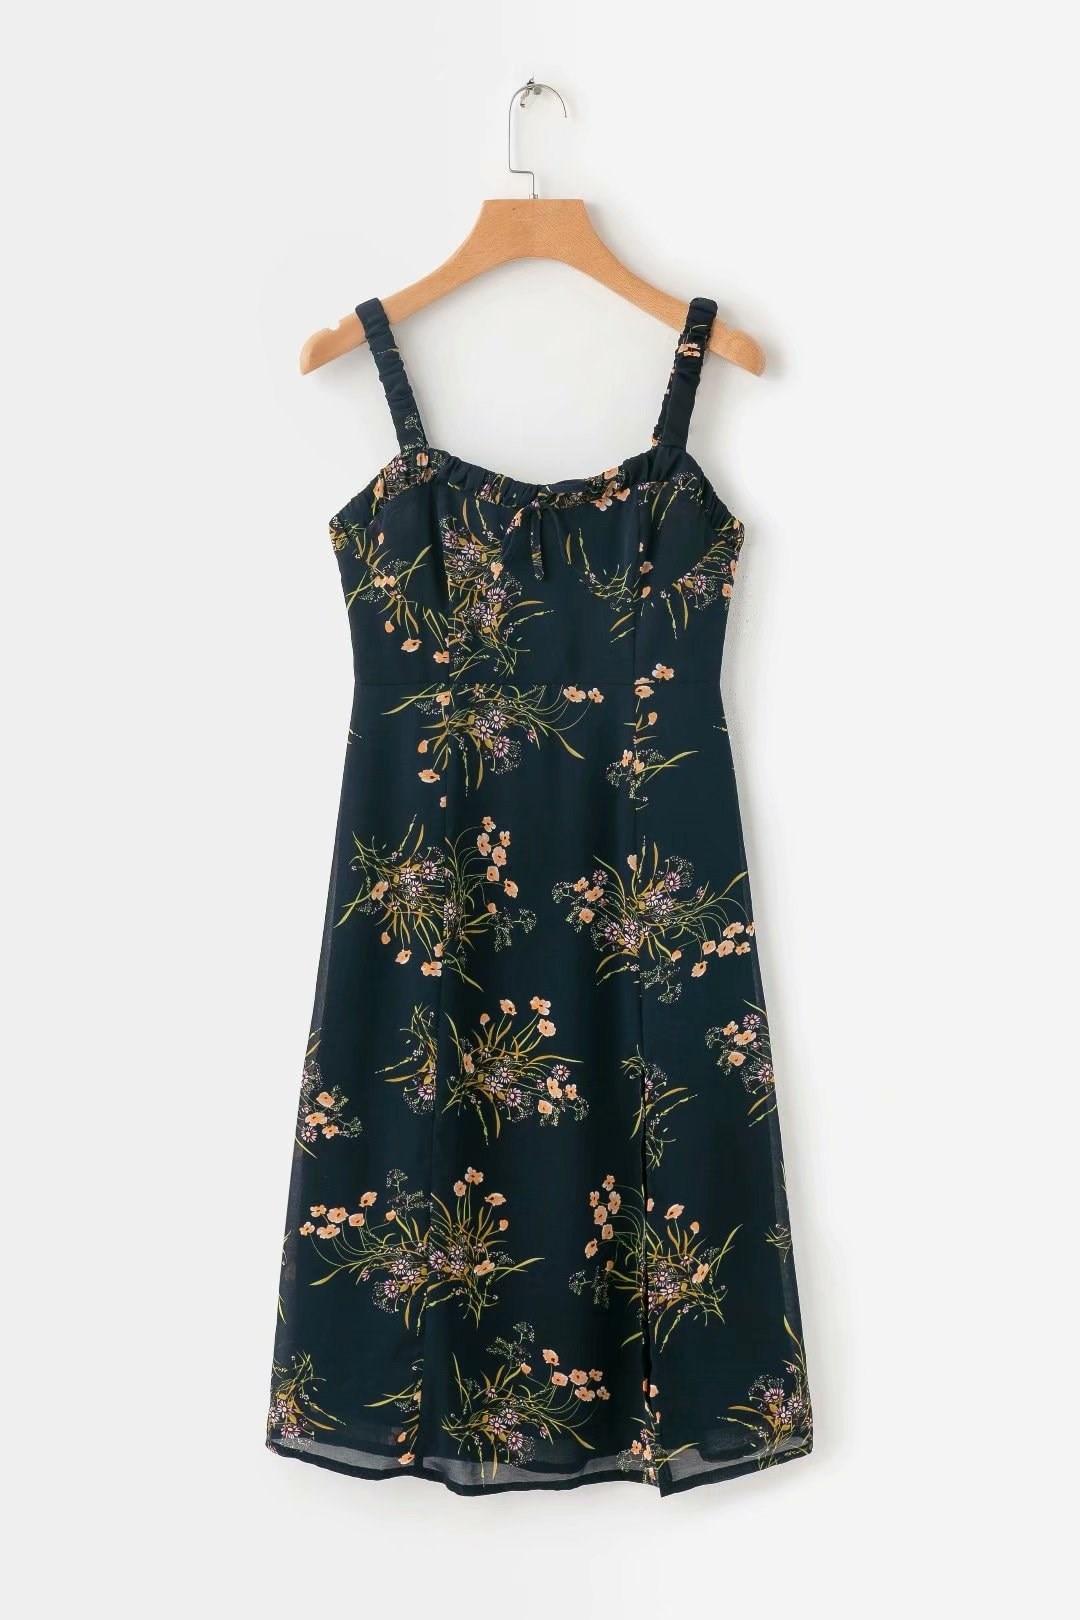 2019 Fashion Women Floral Print Chiffon Dresses Slim Split Midi Dress Black Spaghetti Straps Casual Dress in Dresses from Women 39 s Clothing